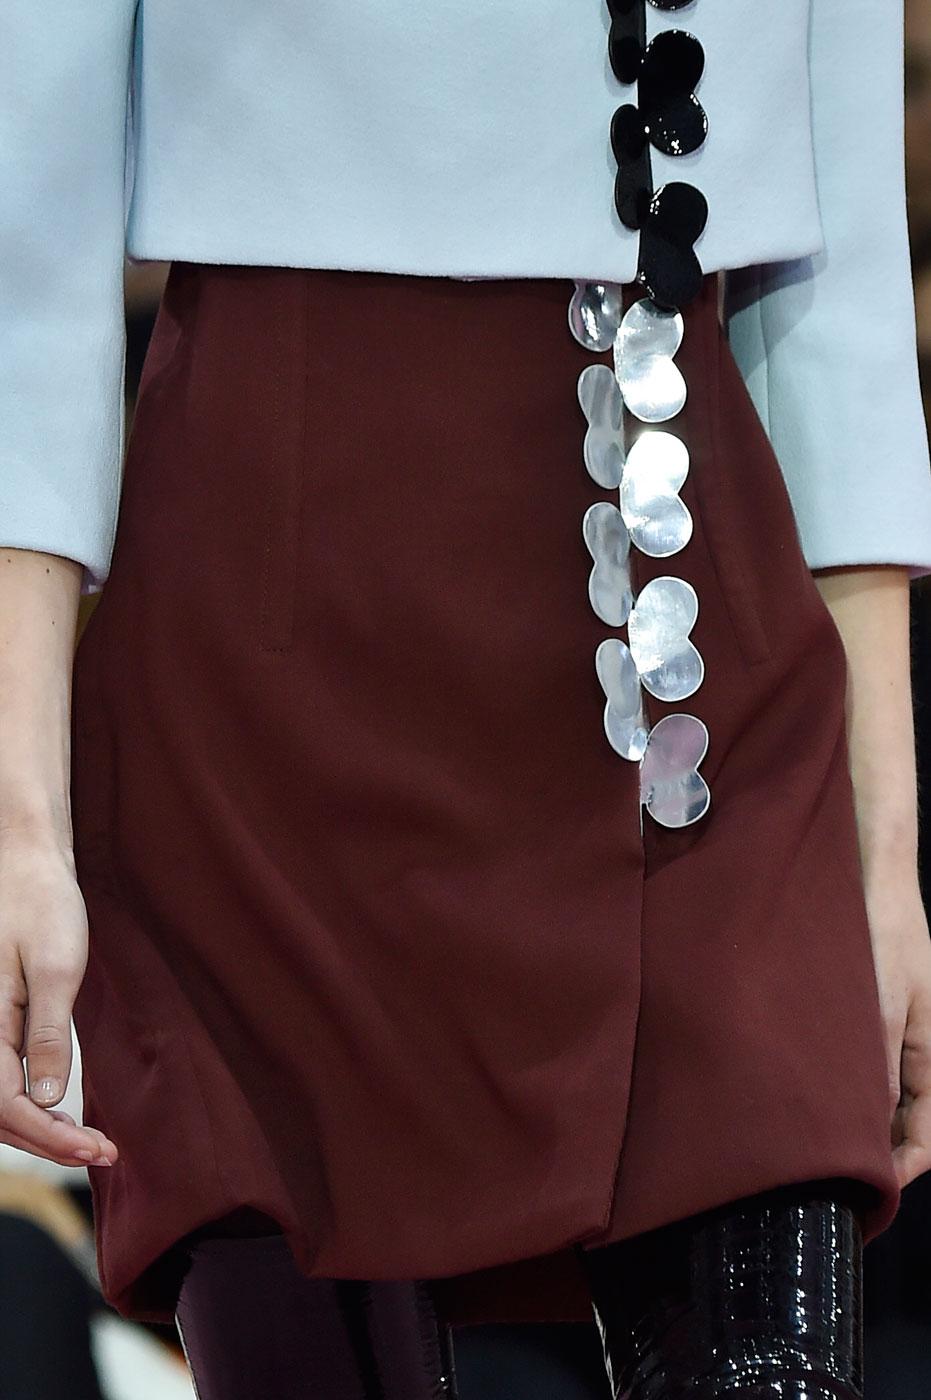 Christian-Dior-fashion-runway-show-close-ups-haute-couture-paris-spring-summer-2015-the-impression-021